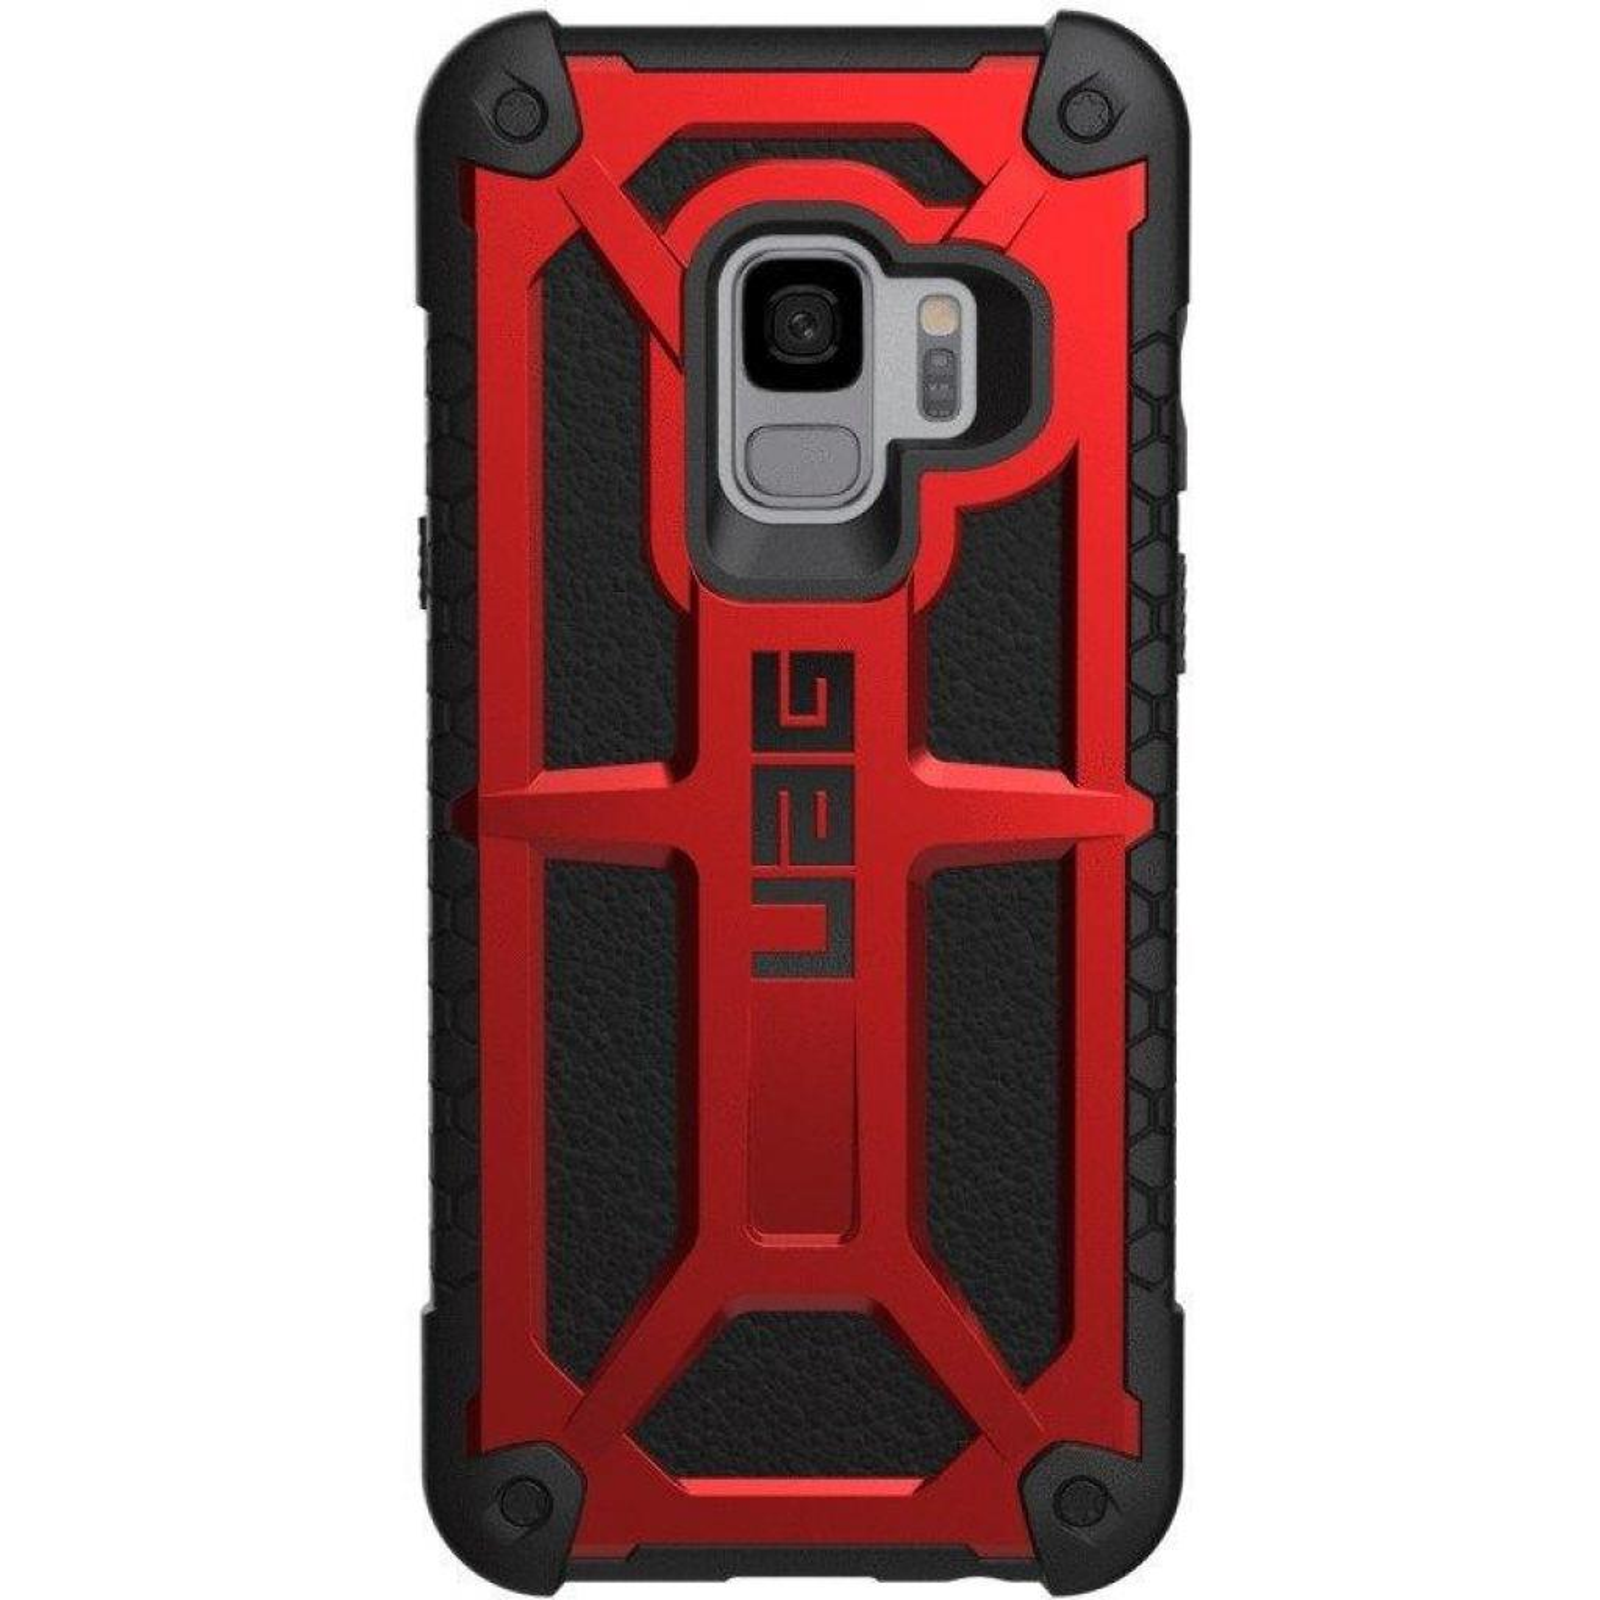 Чехол для моб. телефона Urban Armor Gear Galaxy S9 Monarch Crimson (GLXS9-M-CR)